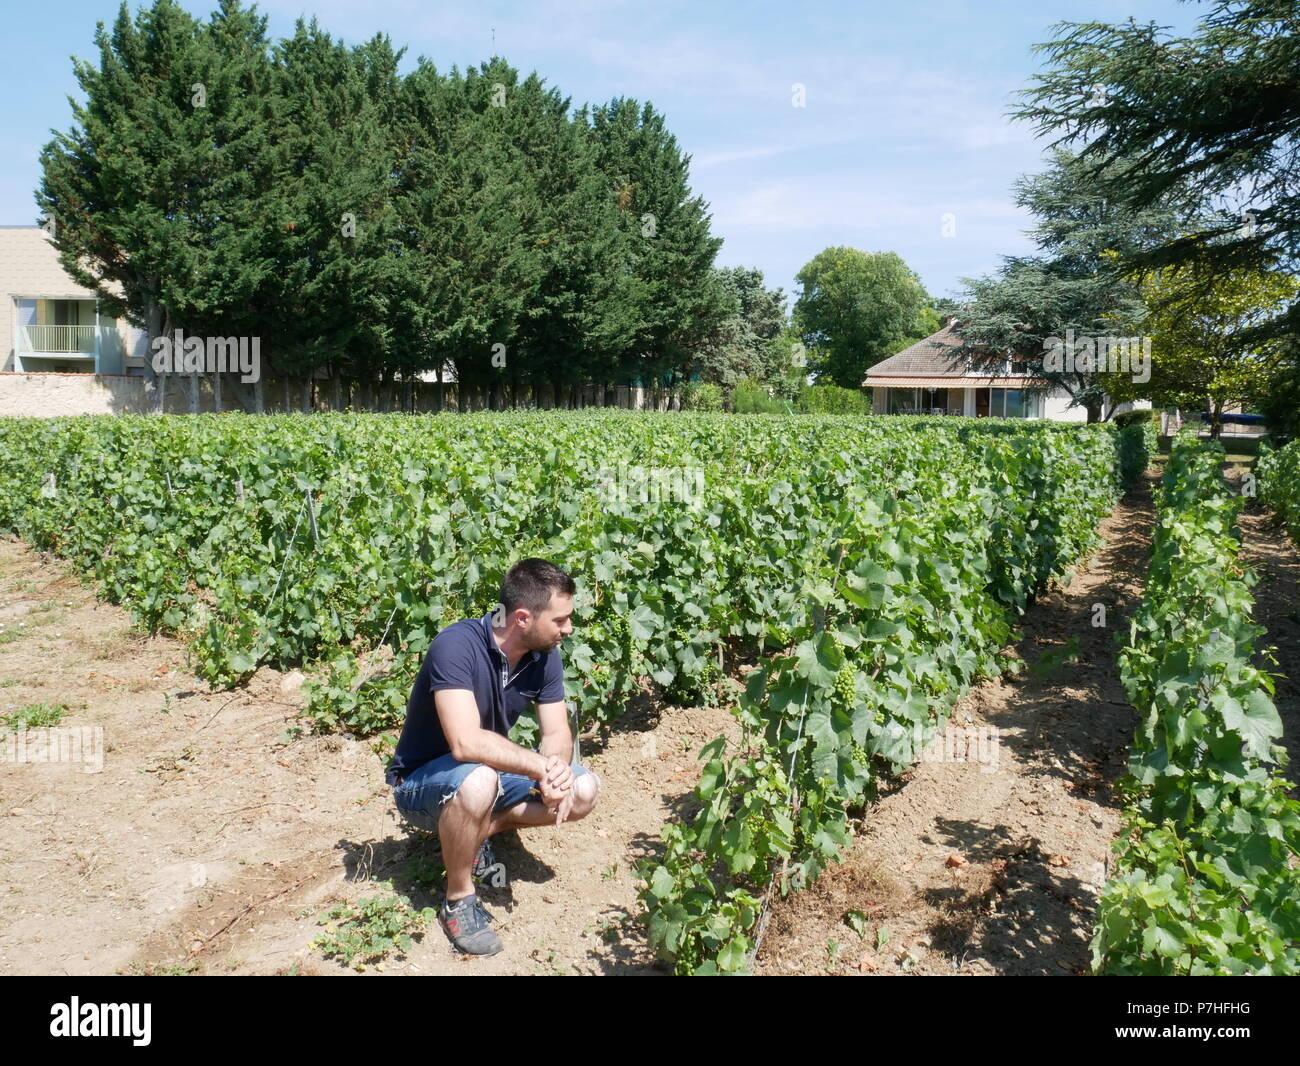 Champagne wine maker Etienne Calsac in his vineyards in Avize, France. - Stock Image